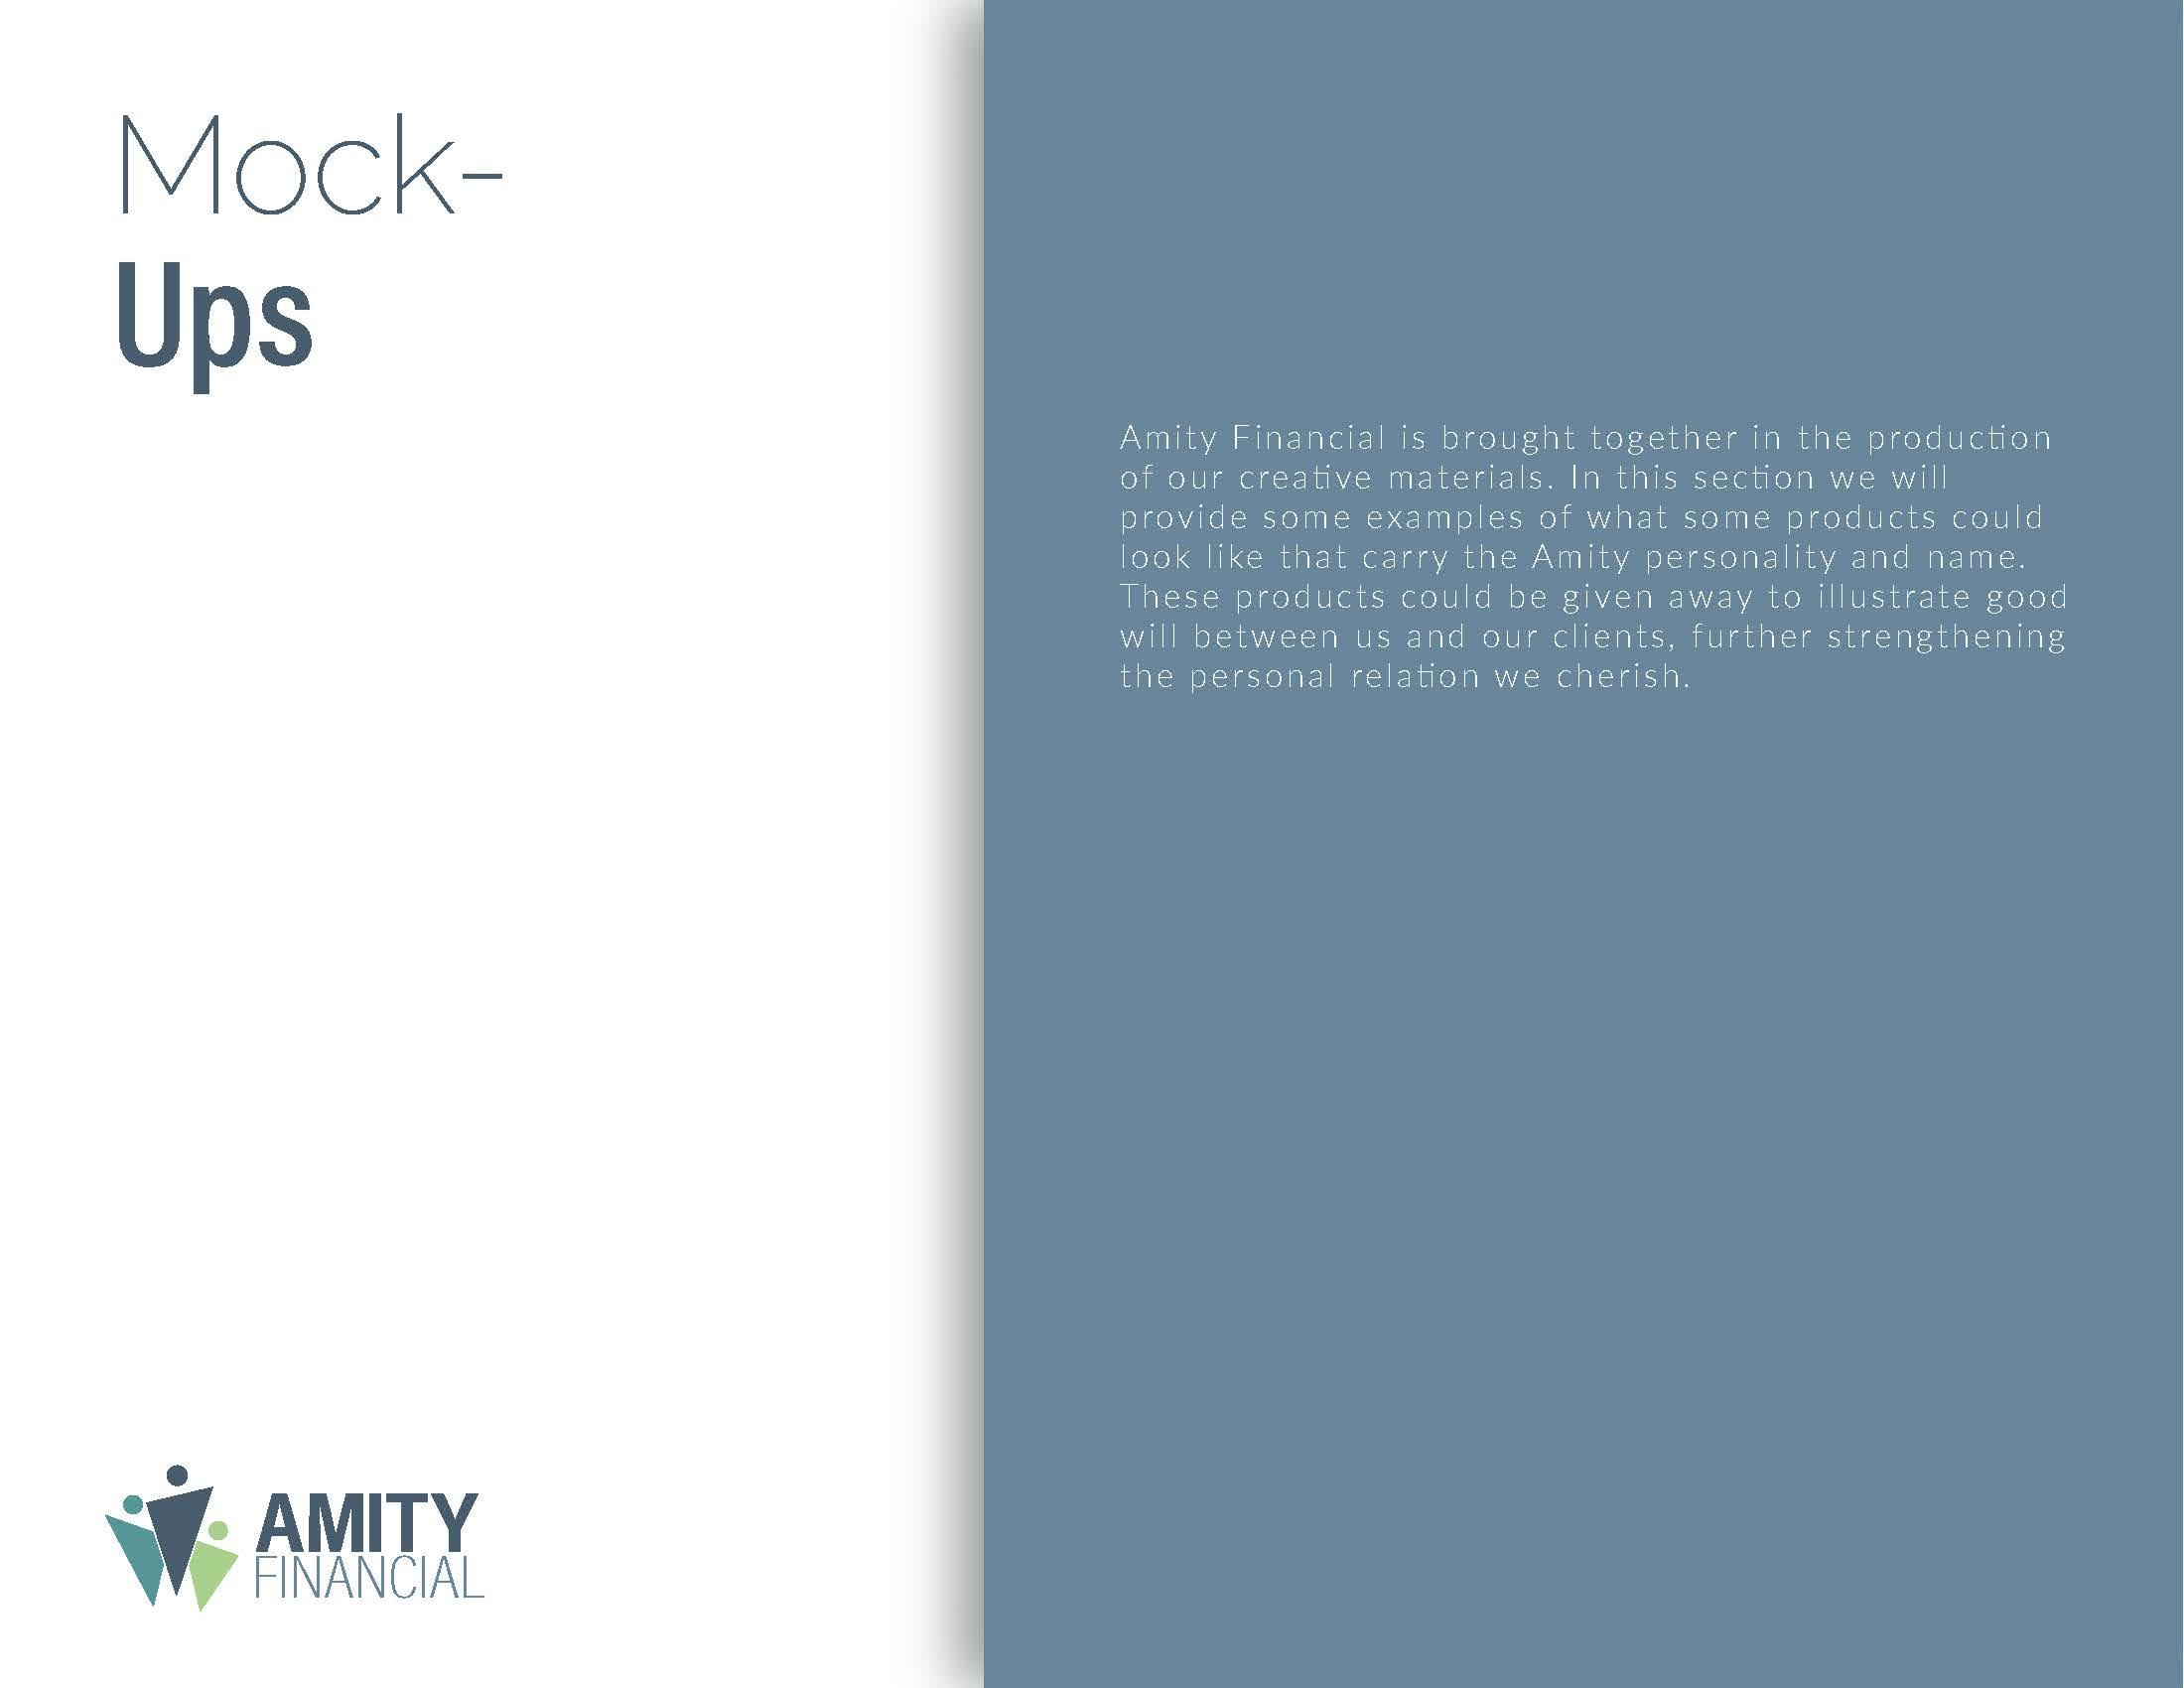 Amity-StyleGuide FINAL_Page_14.jpg